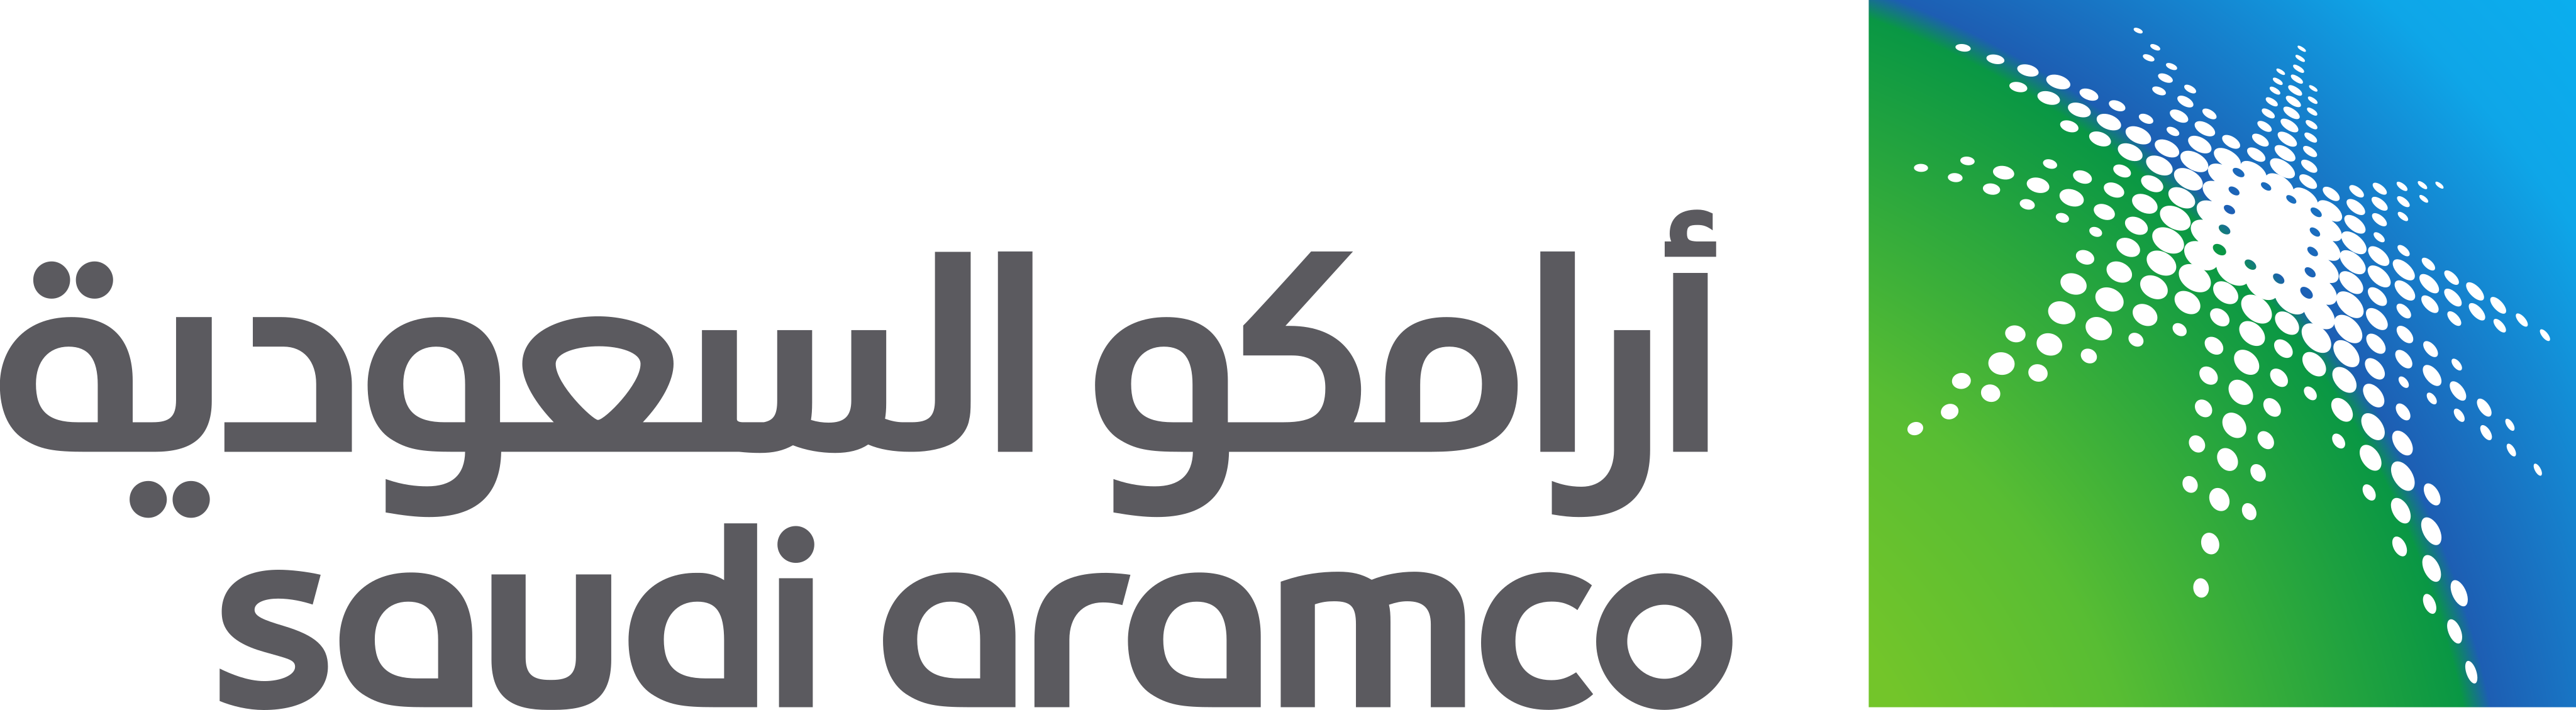 saudi aramco logo - Saudi Aramco Logo